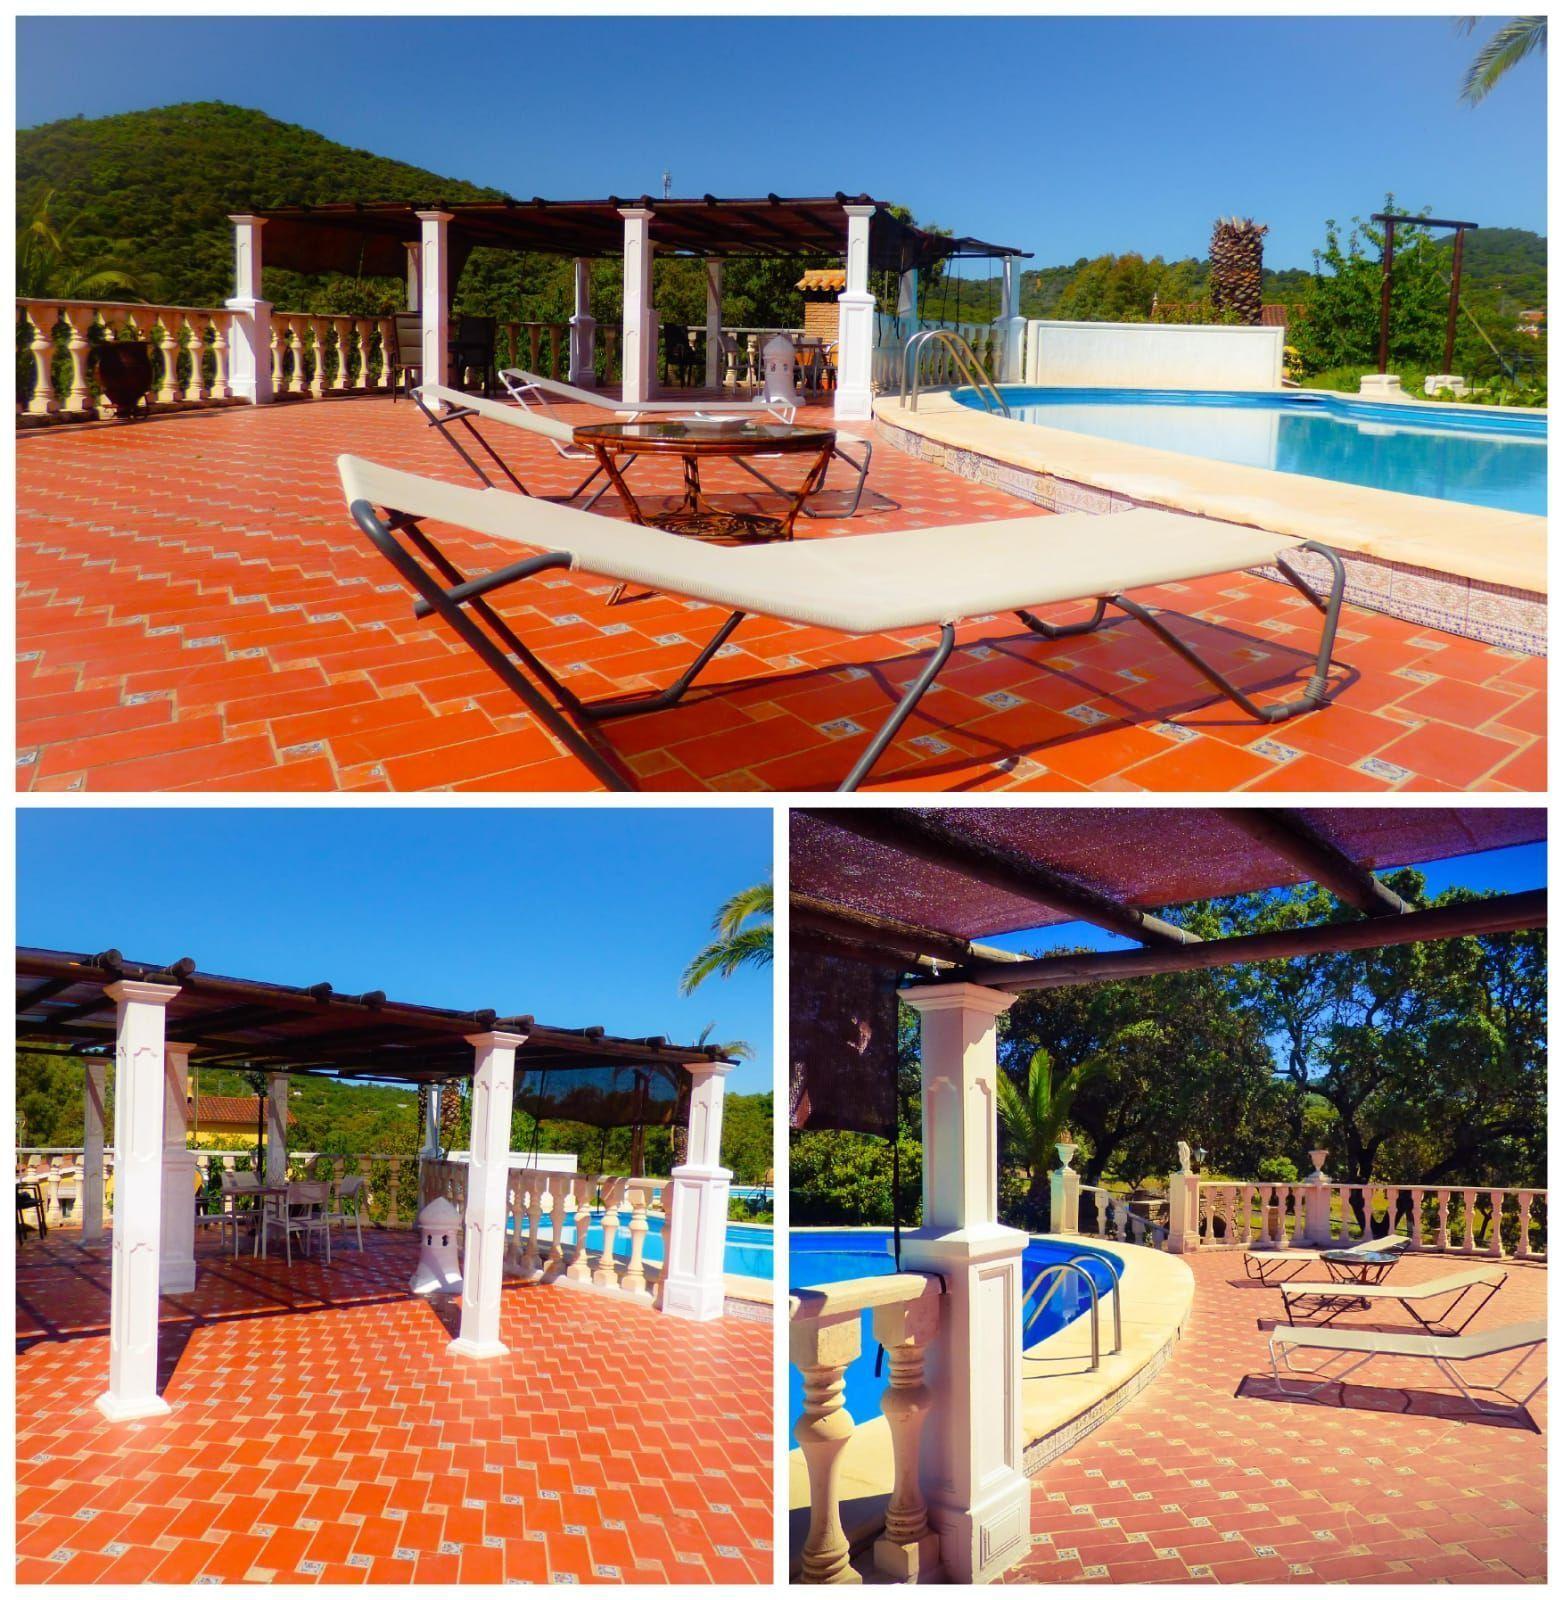 Private Solarium terrace, Lake house